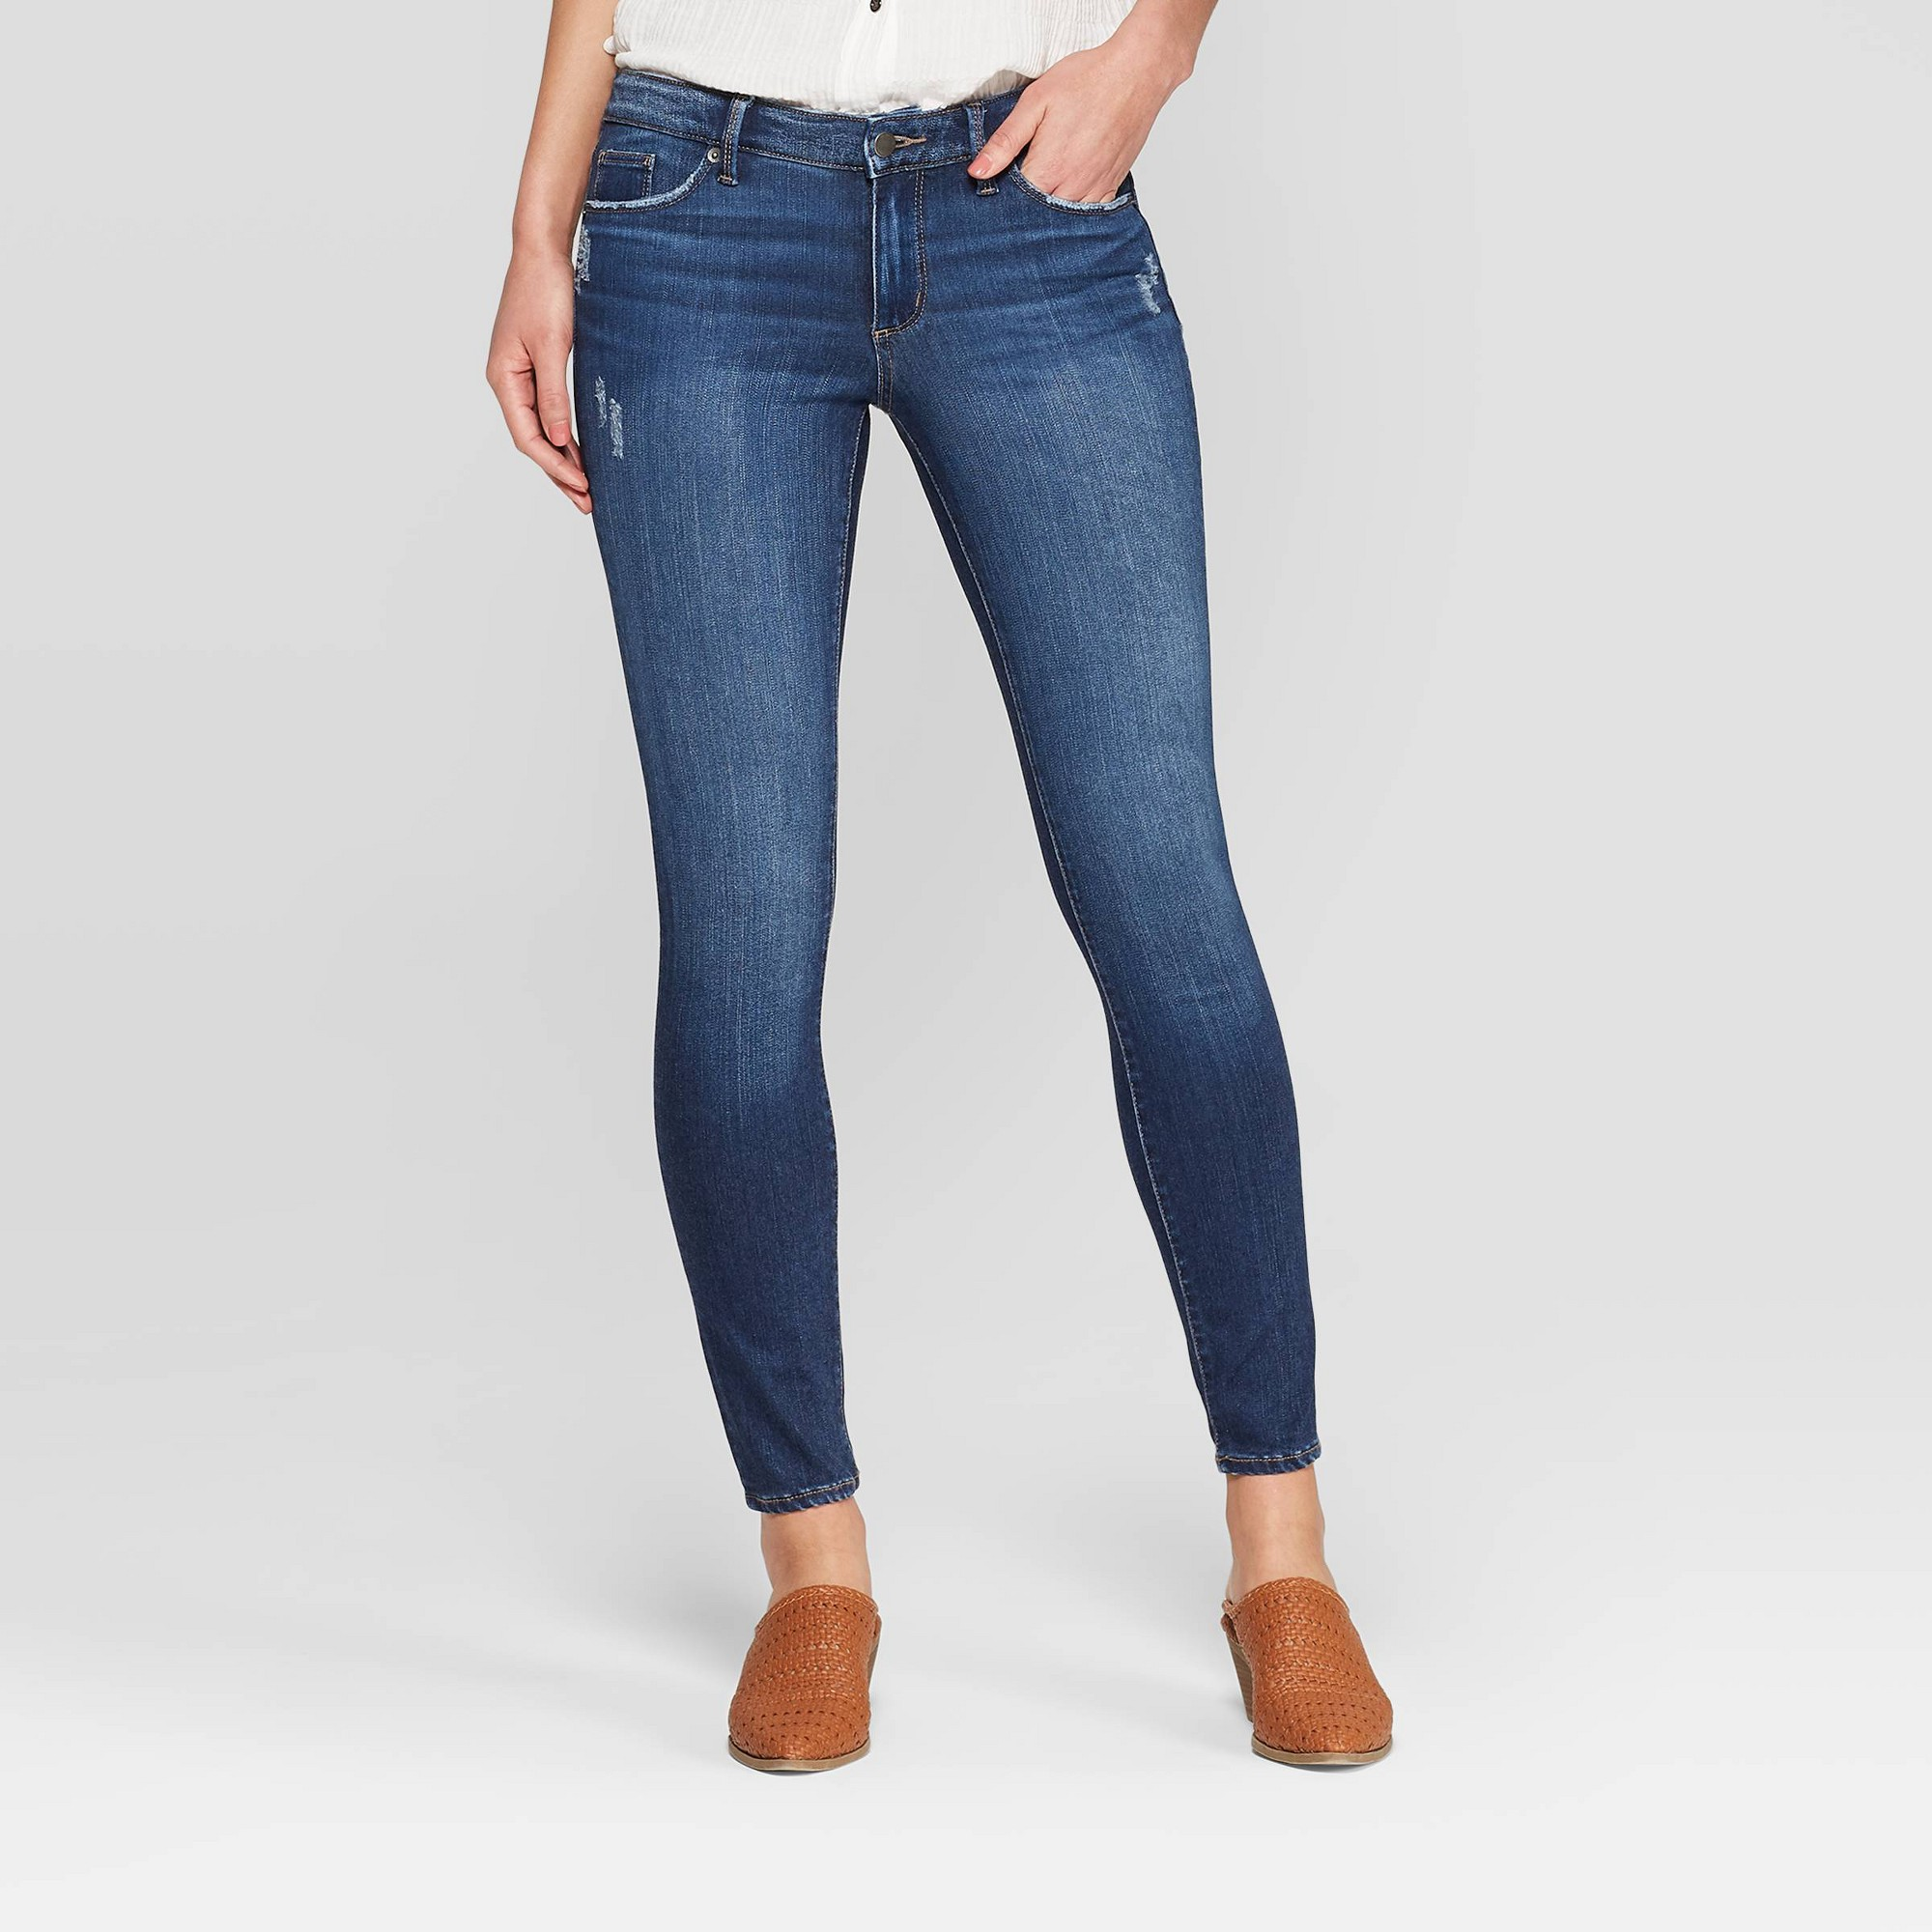 Women's Mid-Rise Skinny Jeans - Universal Thread Dark Wash 00, Blue